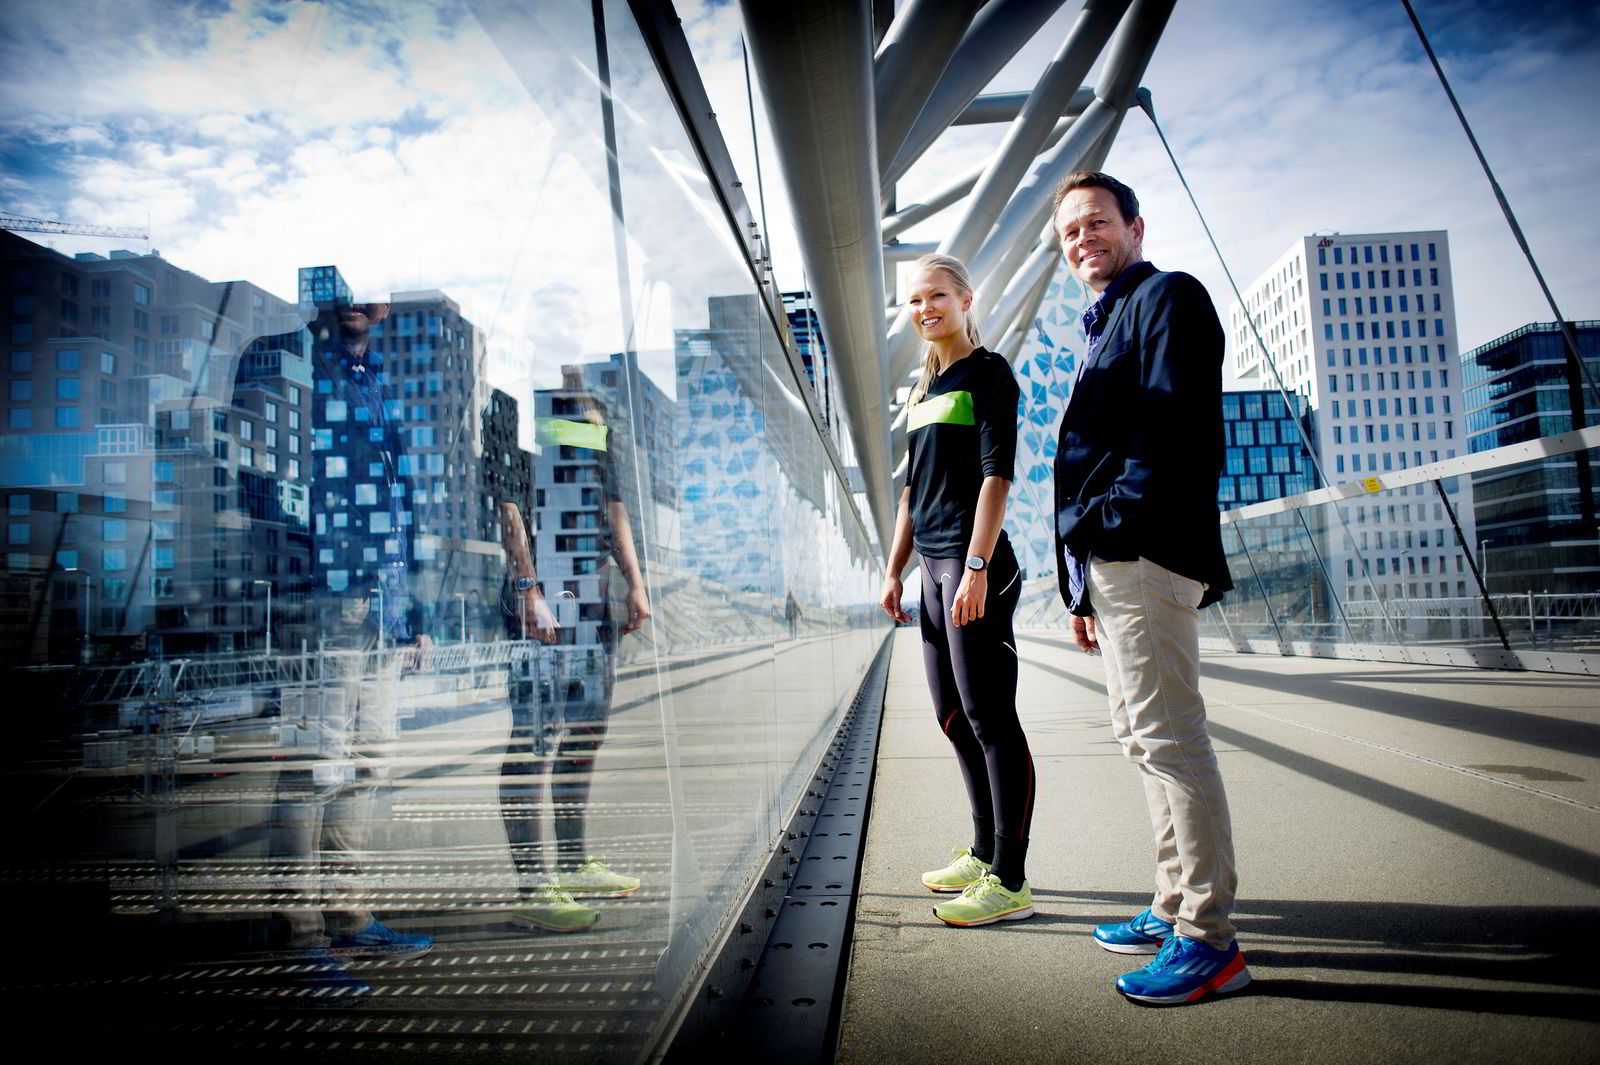 Personlig trener Hedvig Bang fra Elixia Bjørvika og Lars Thorrud general manager i Ithaca Petroleum Holdings As henholdsvis arrangerer og løper trappeløpet, Barcode Challenge i Bjørvika i ettermiddag. Foto Mikaela Berg